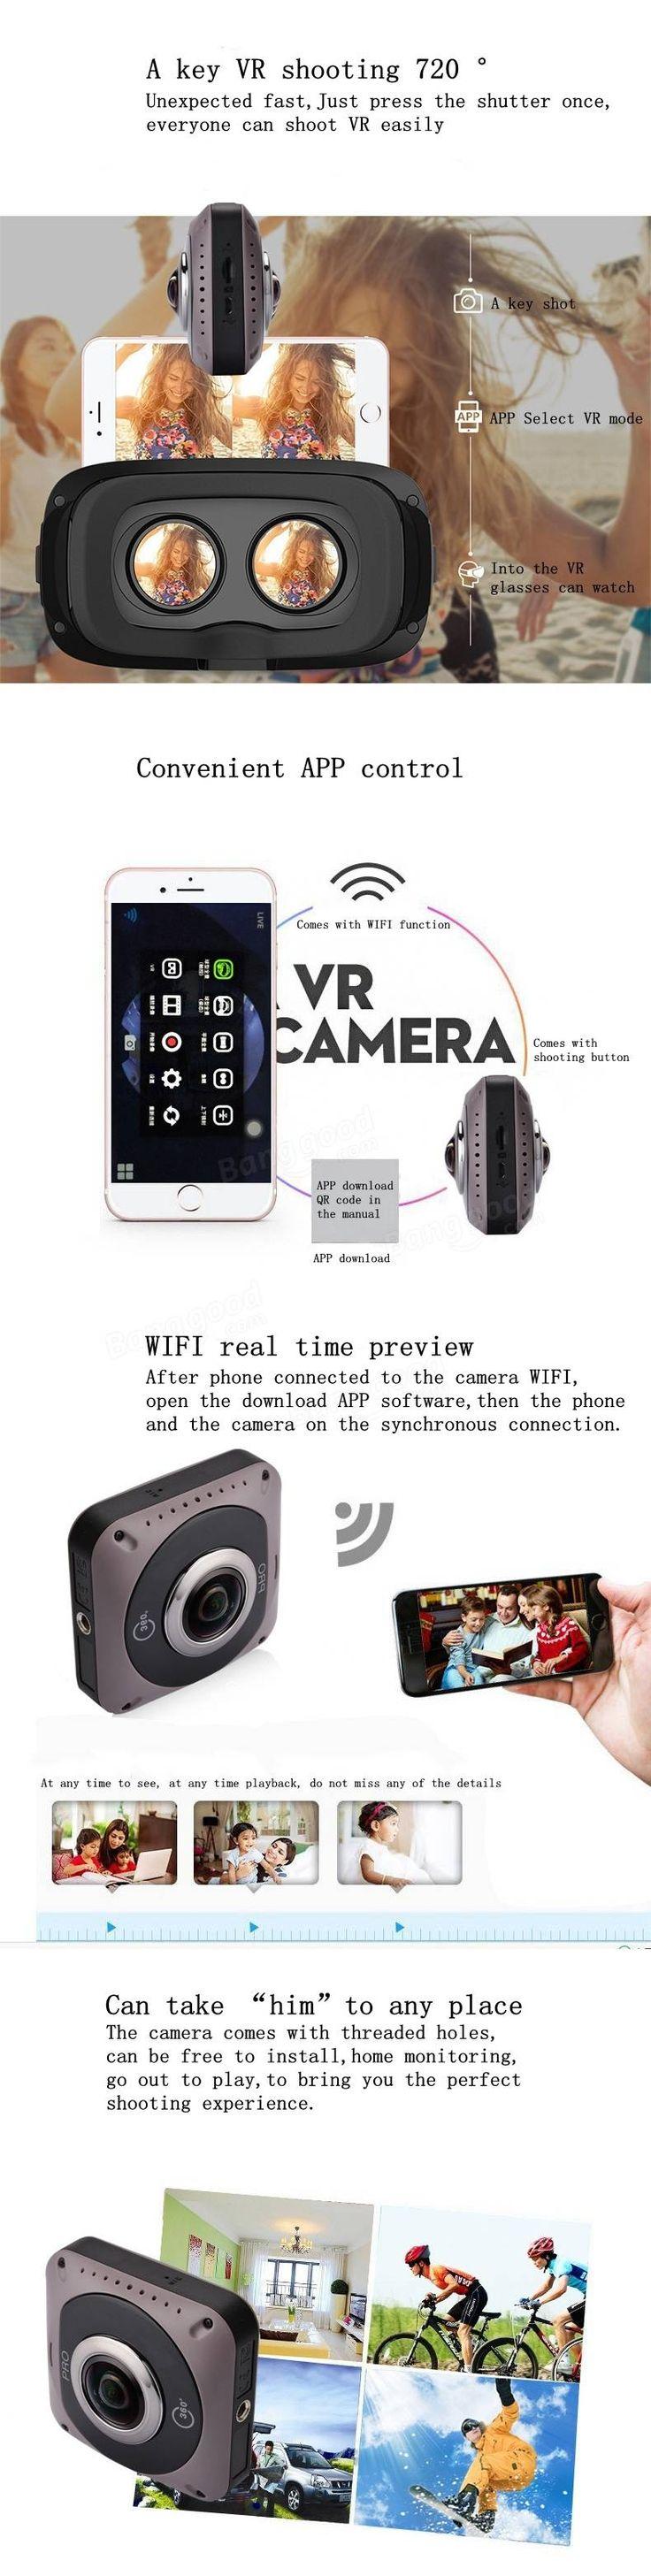 360°*360° Panoramic VR Sports Camera 720° Mini WiFi Action Sports DV Double Sided Fish Eyes Lens Gravity Sensor